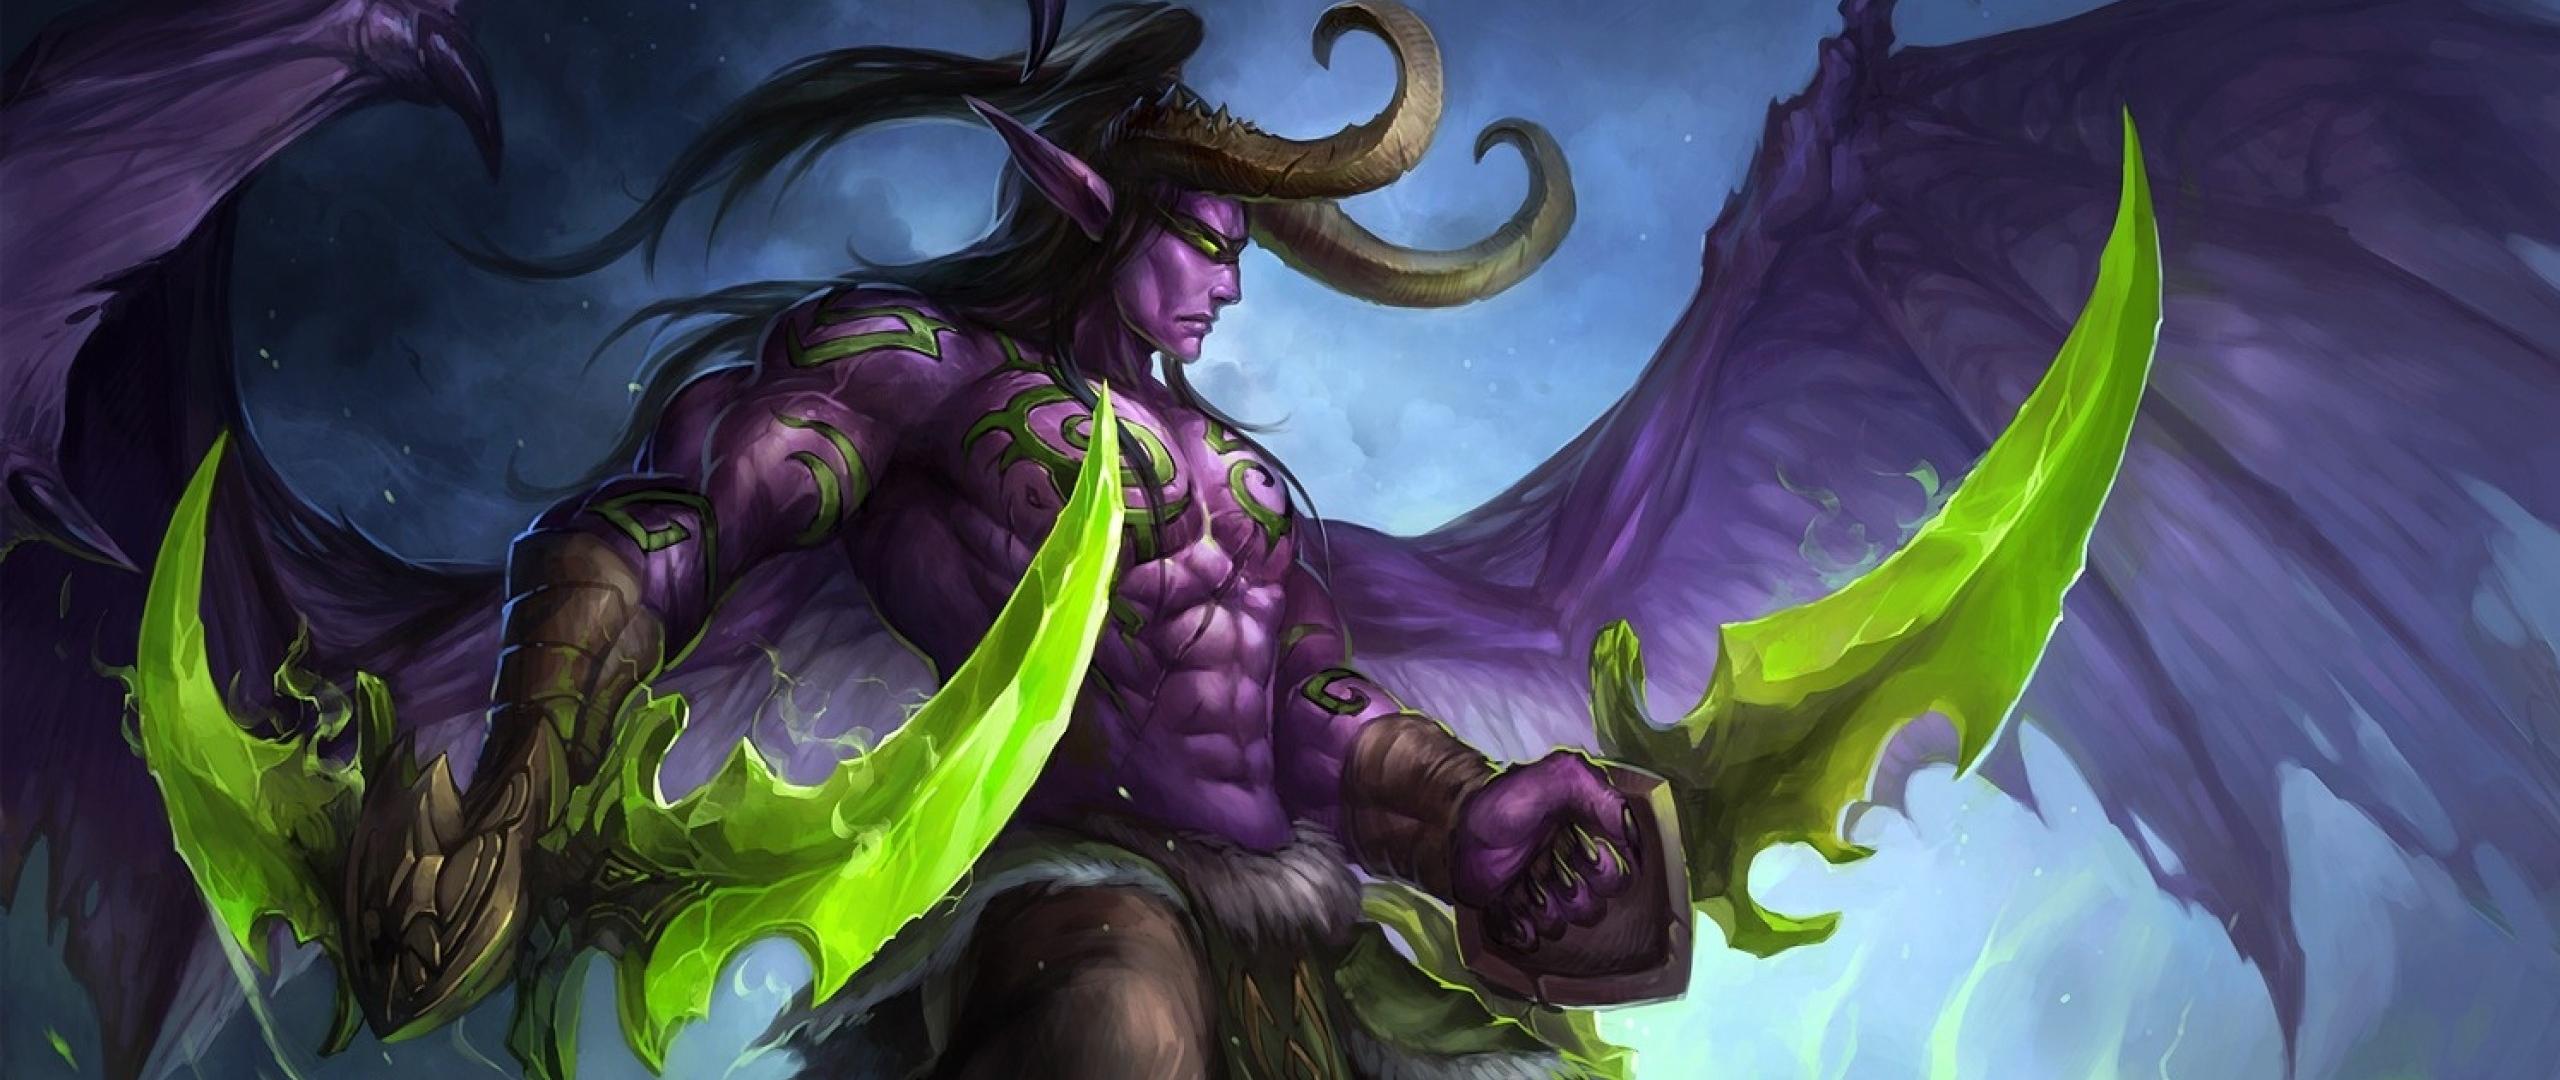 Warcraft wallpaper cosplay illidan xxx naked pics